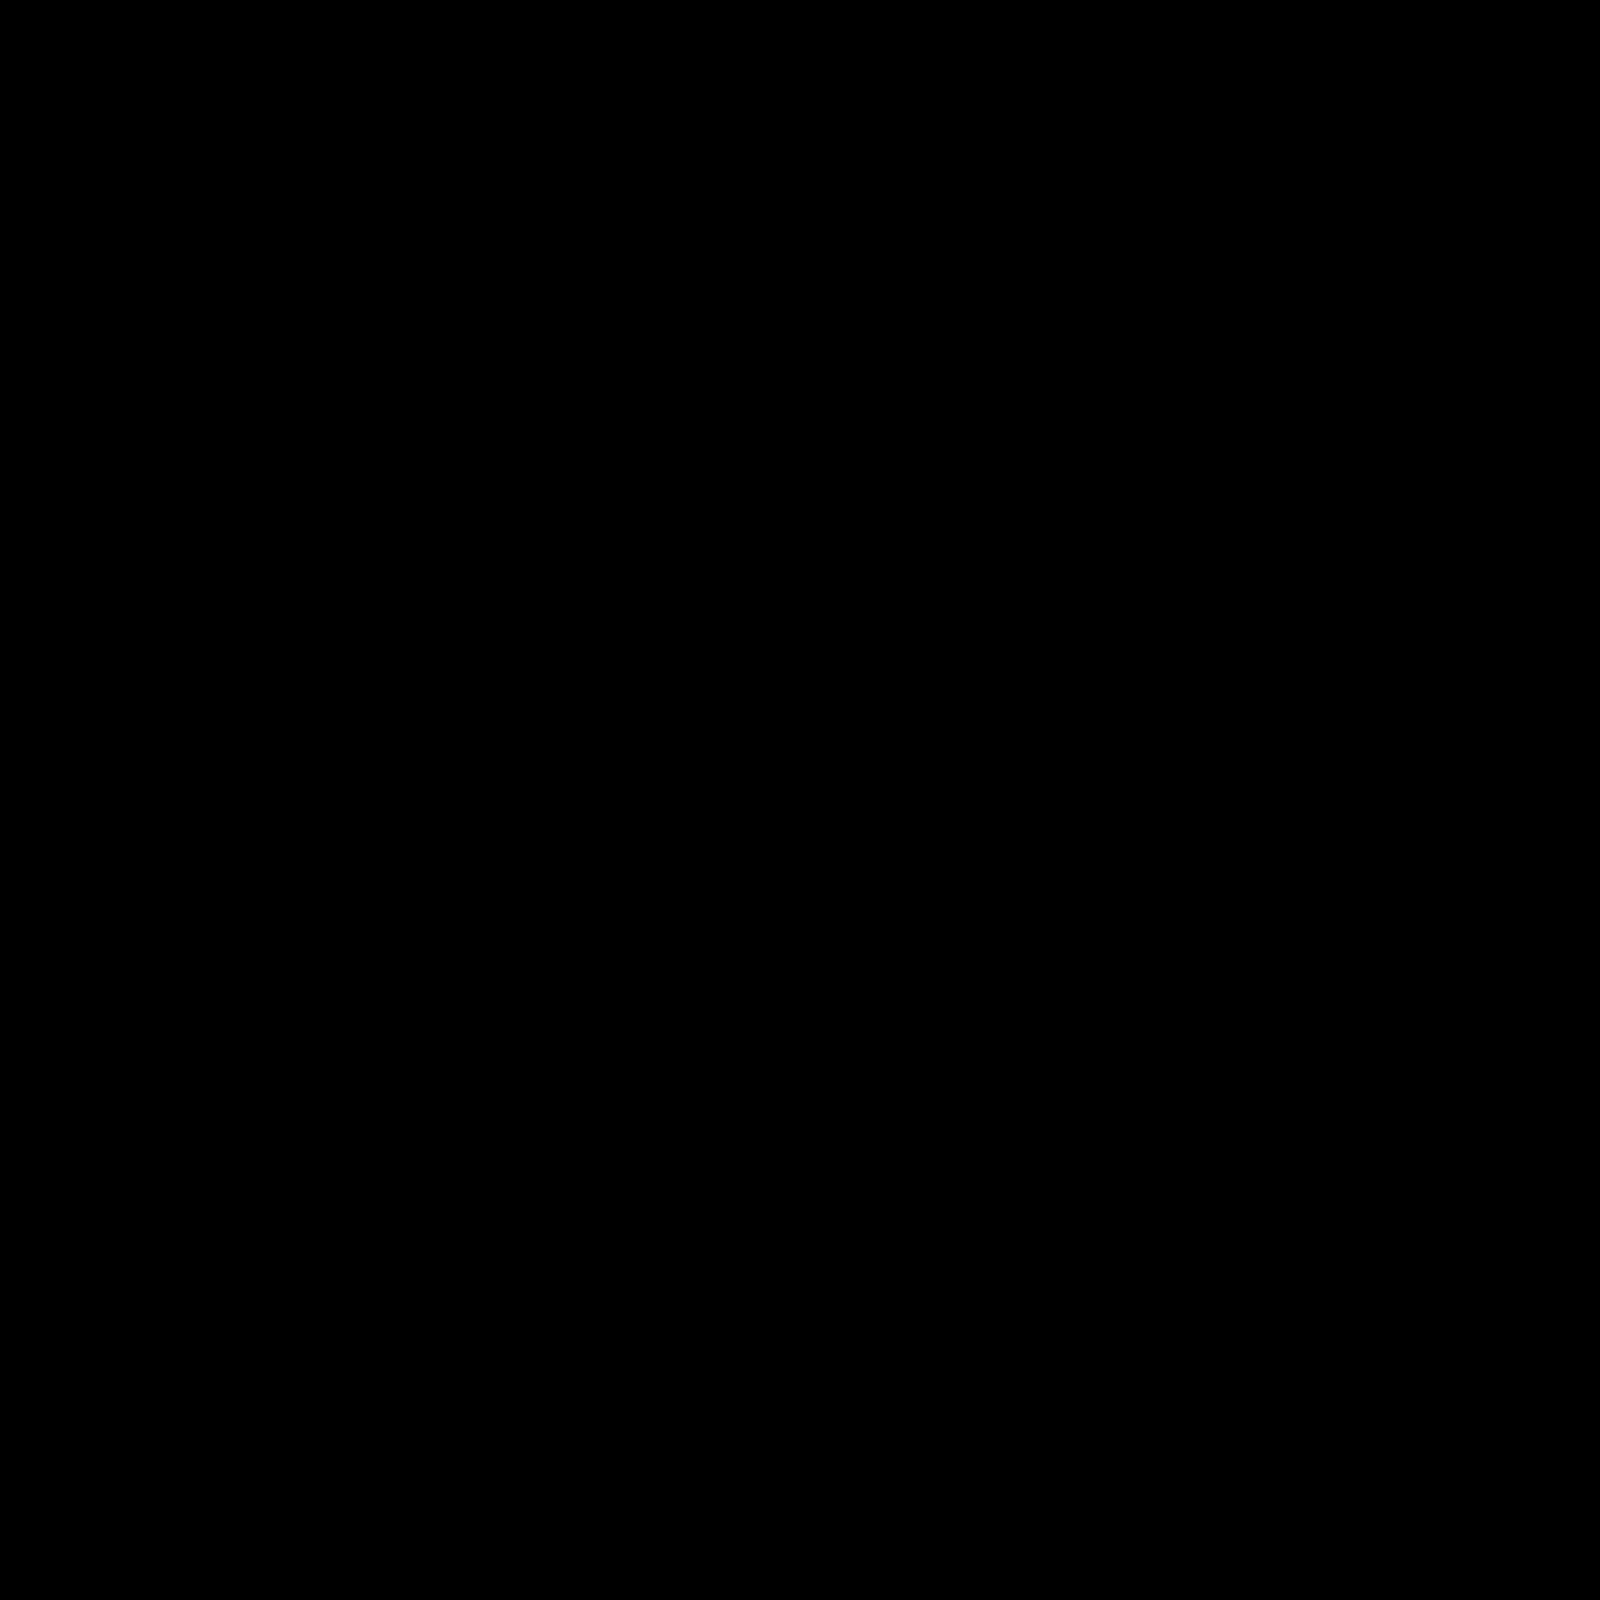 clip art black and white List View Icon